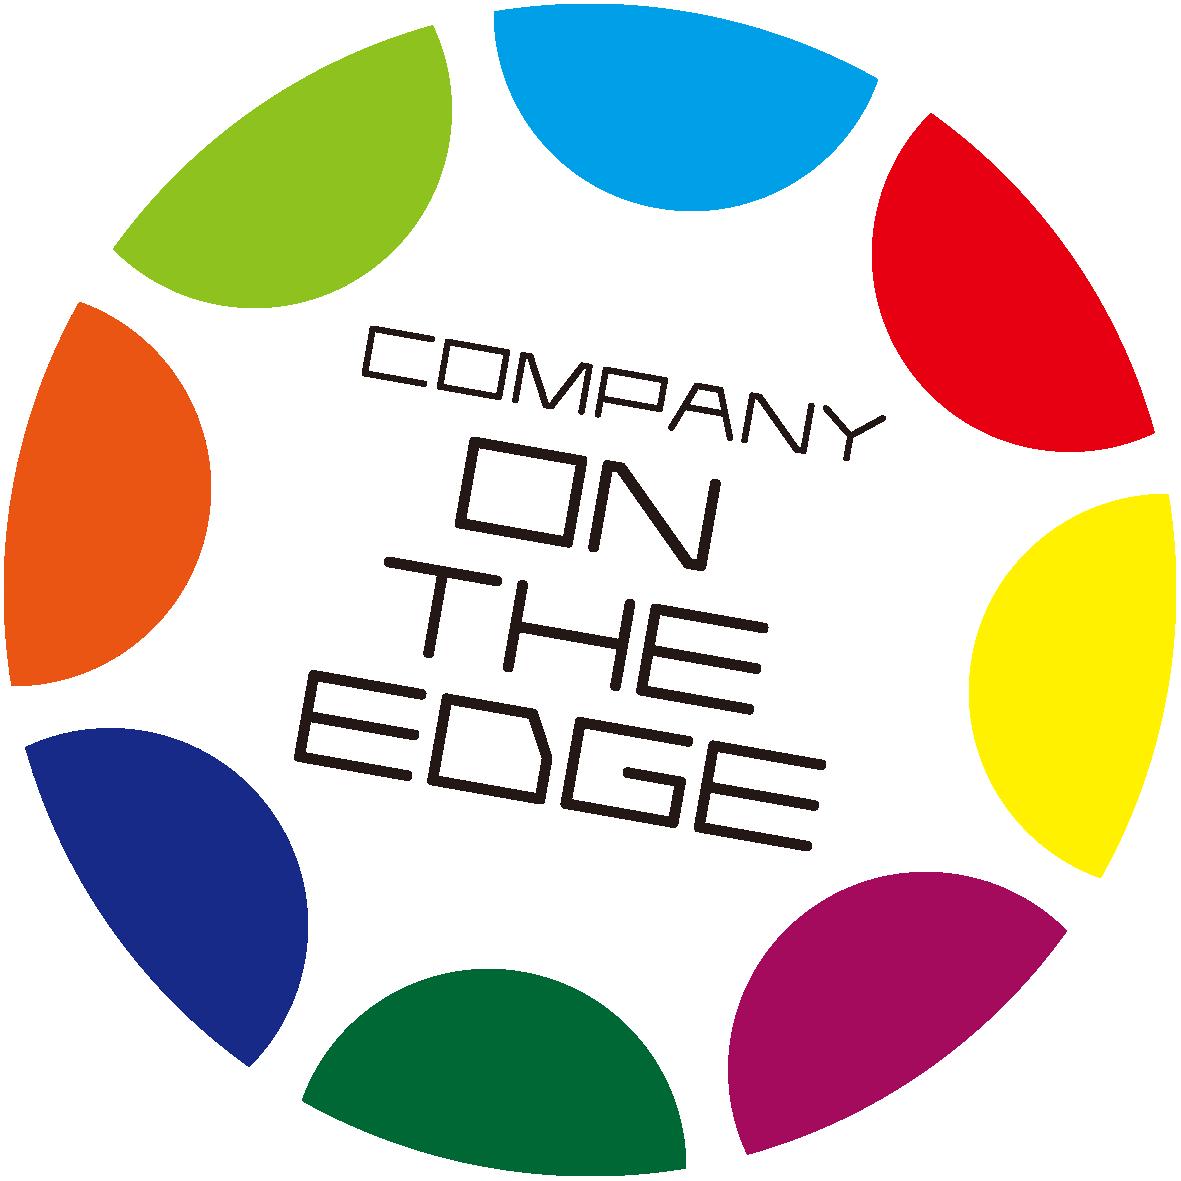 ON THE EDGE 株式会社のロゴ